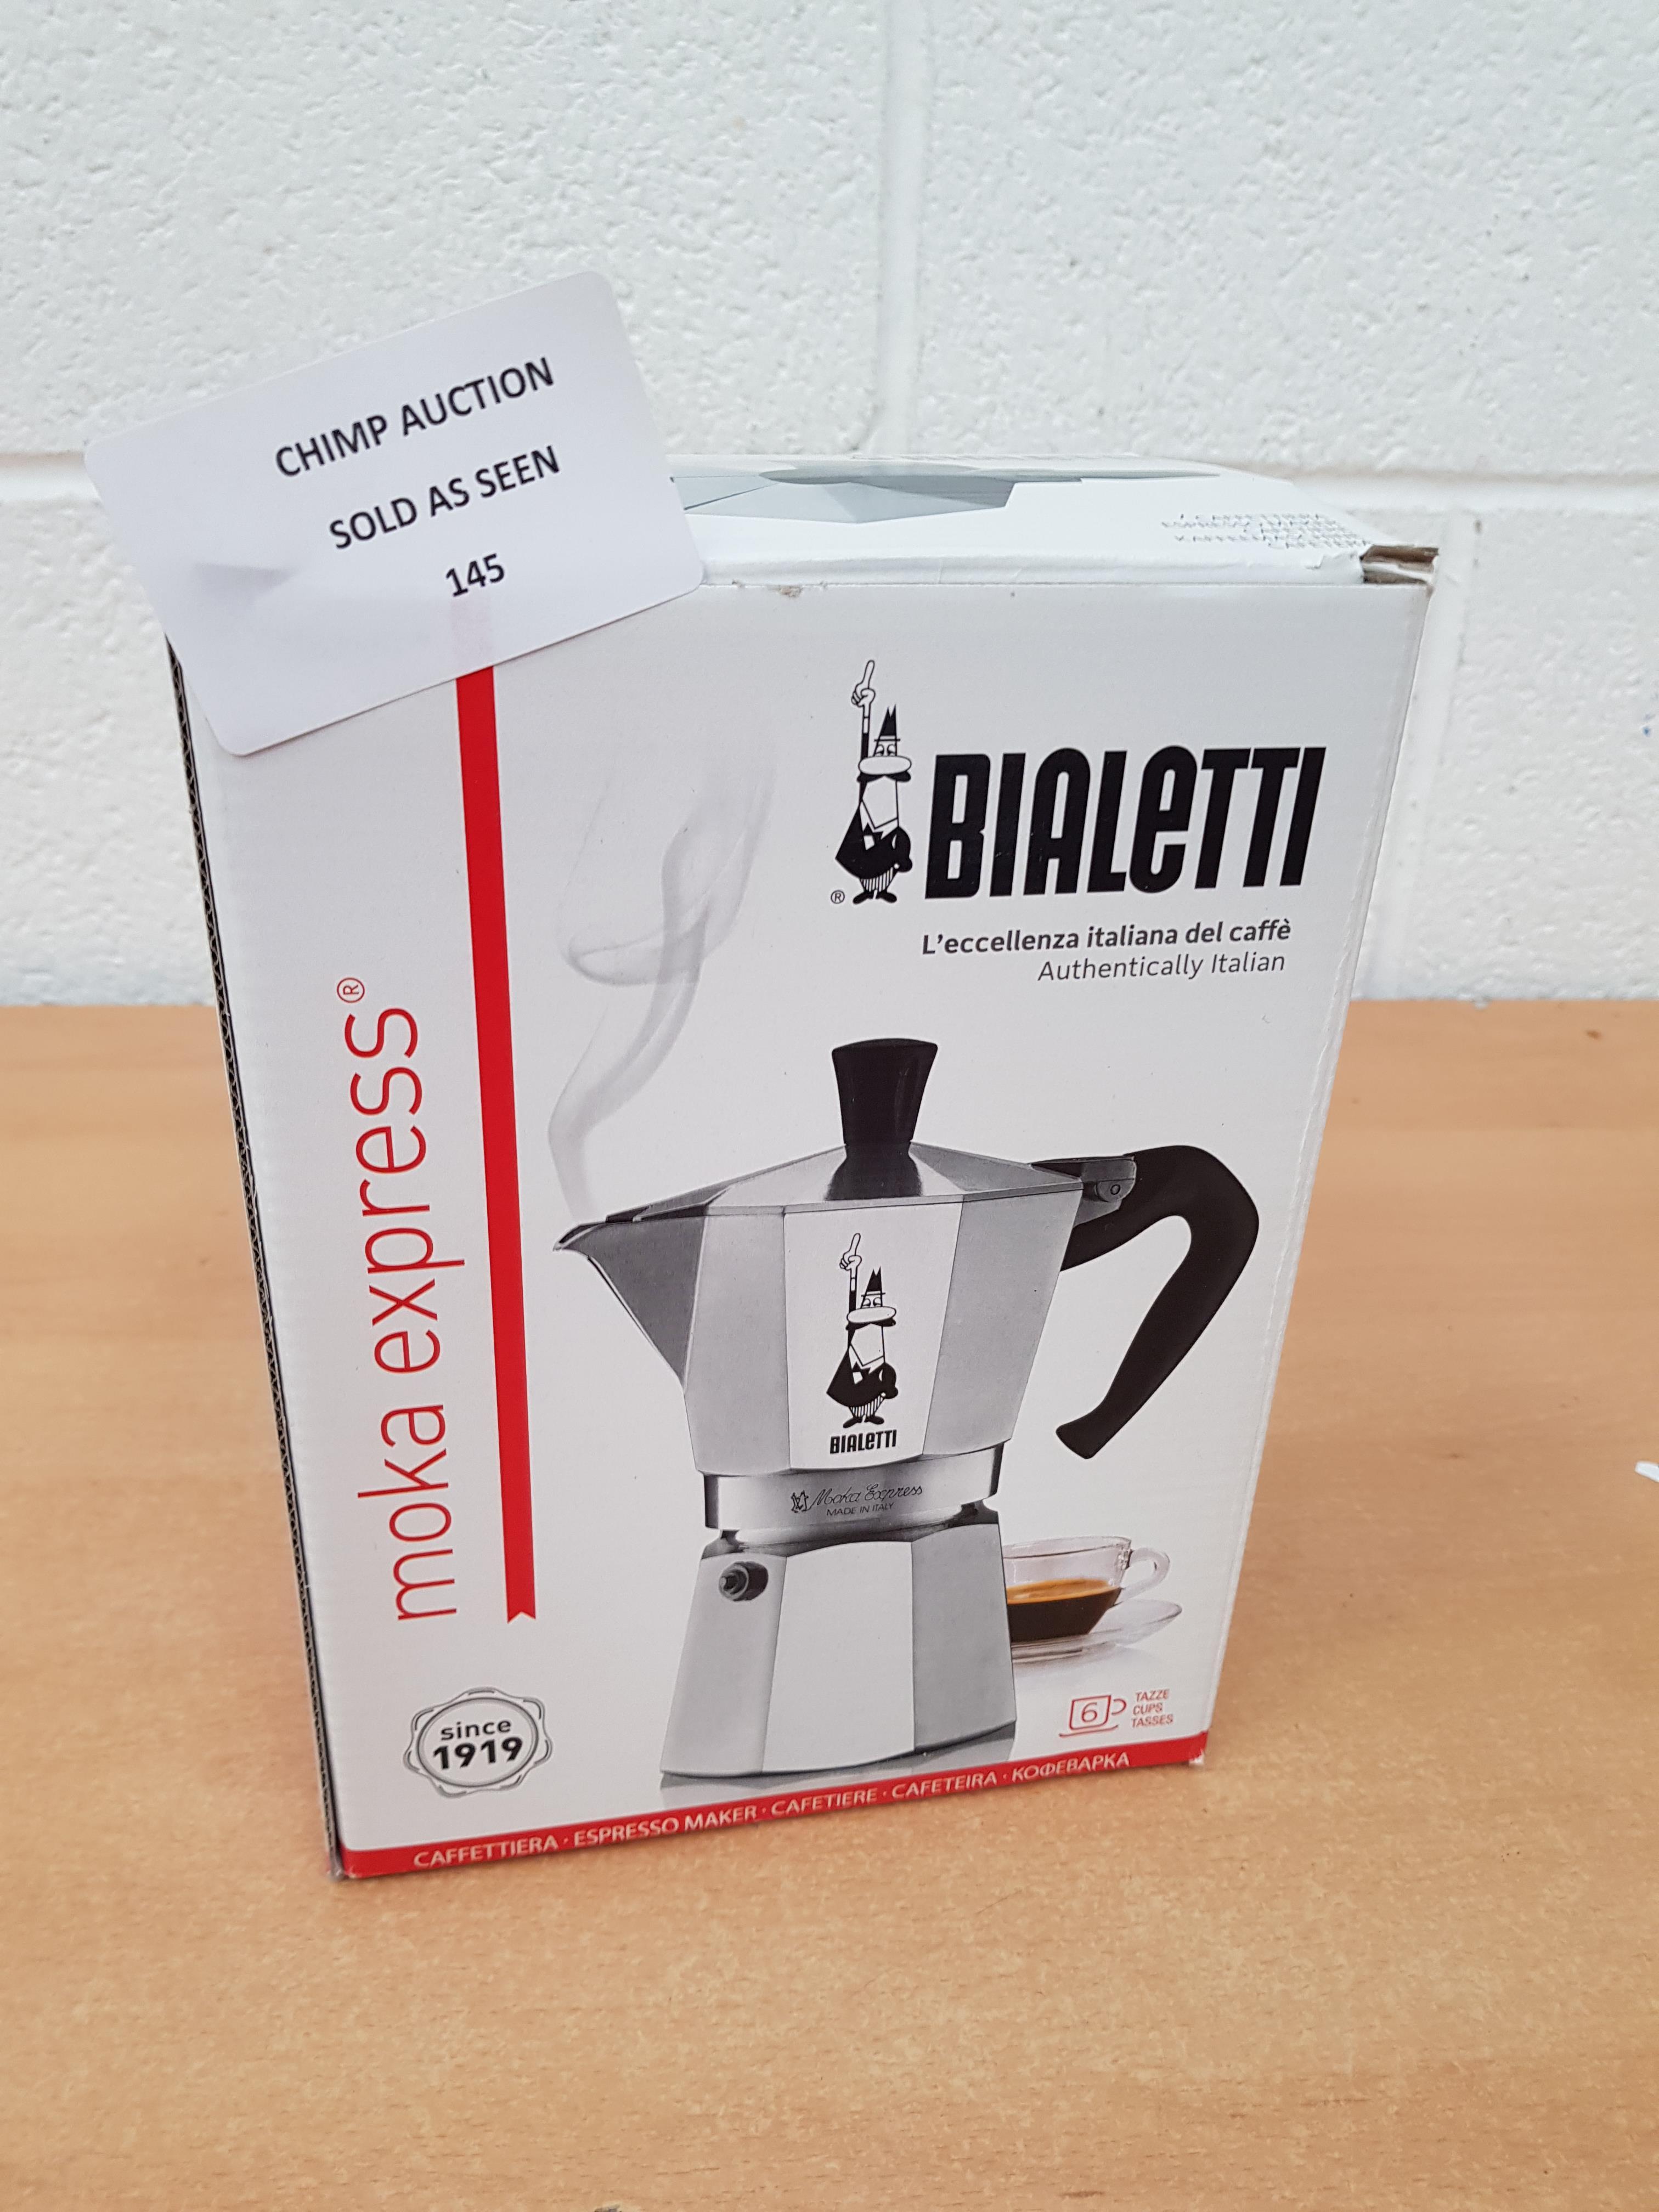 Lot 145 - Bialetti Moka express coffee maker